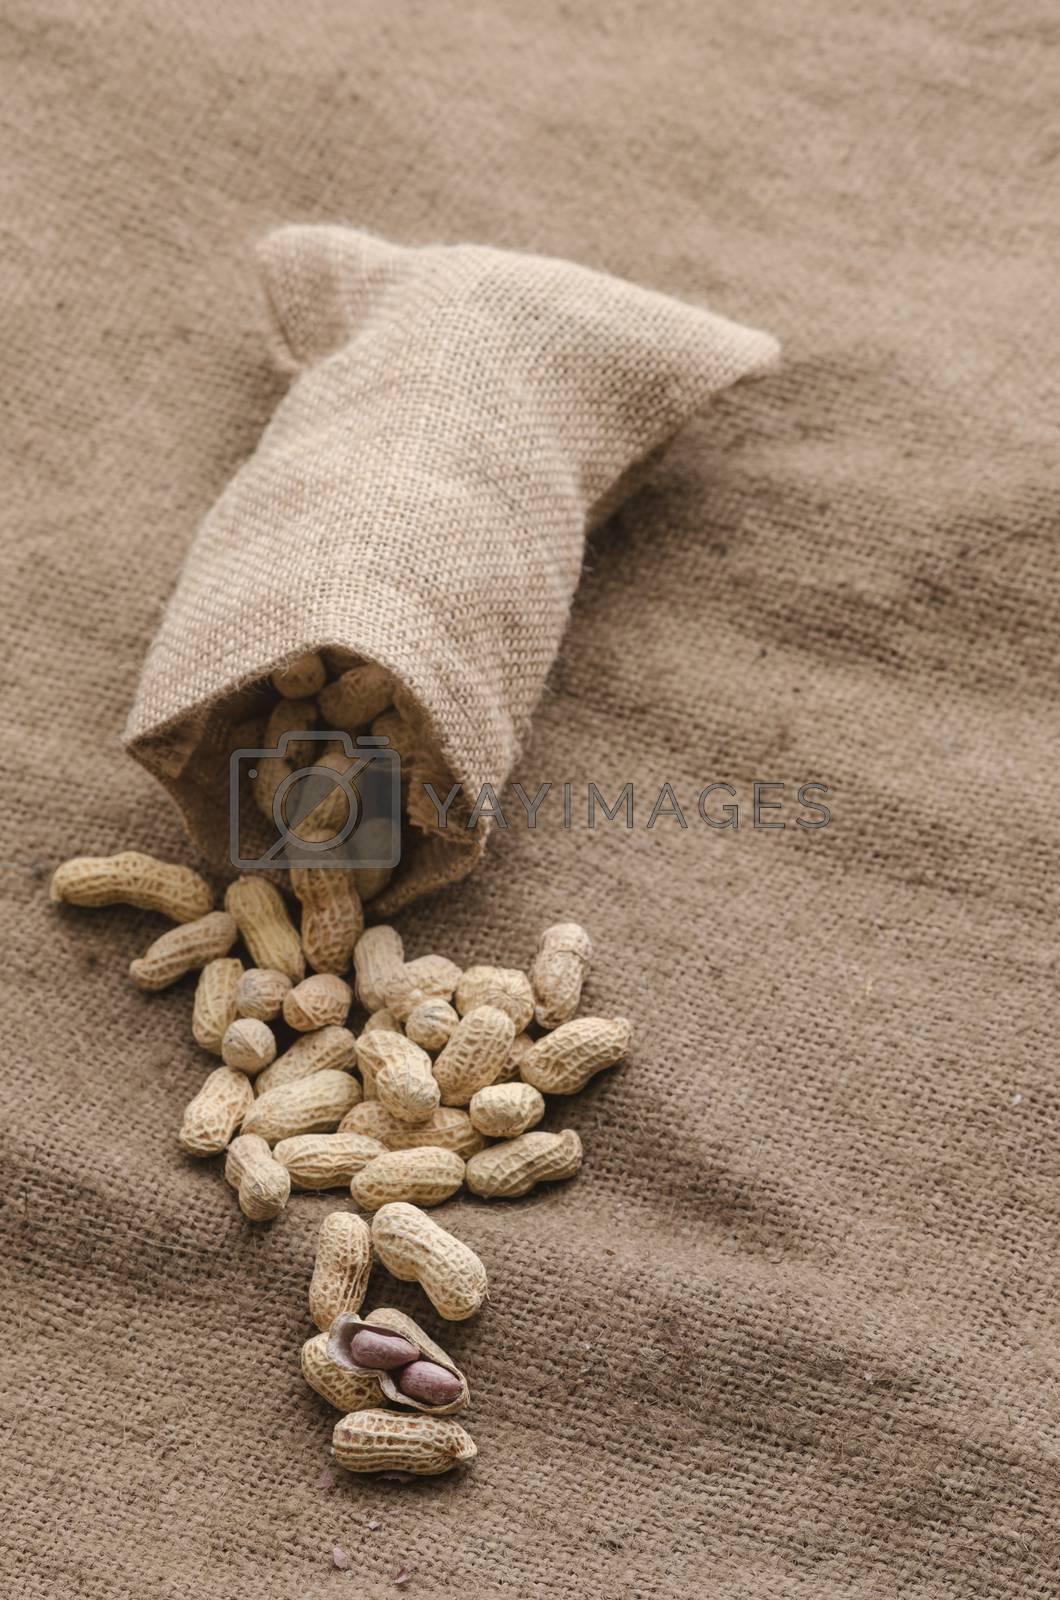 Roasted peanuts on sackcloth background